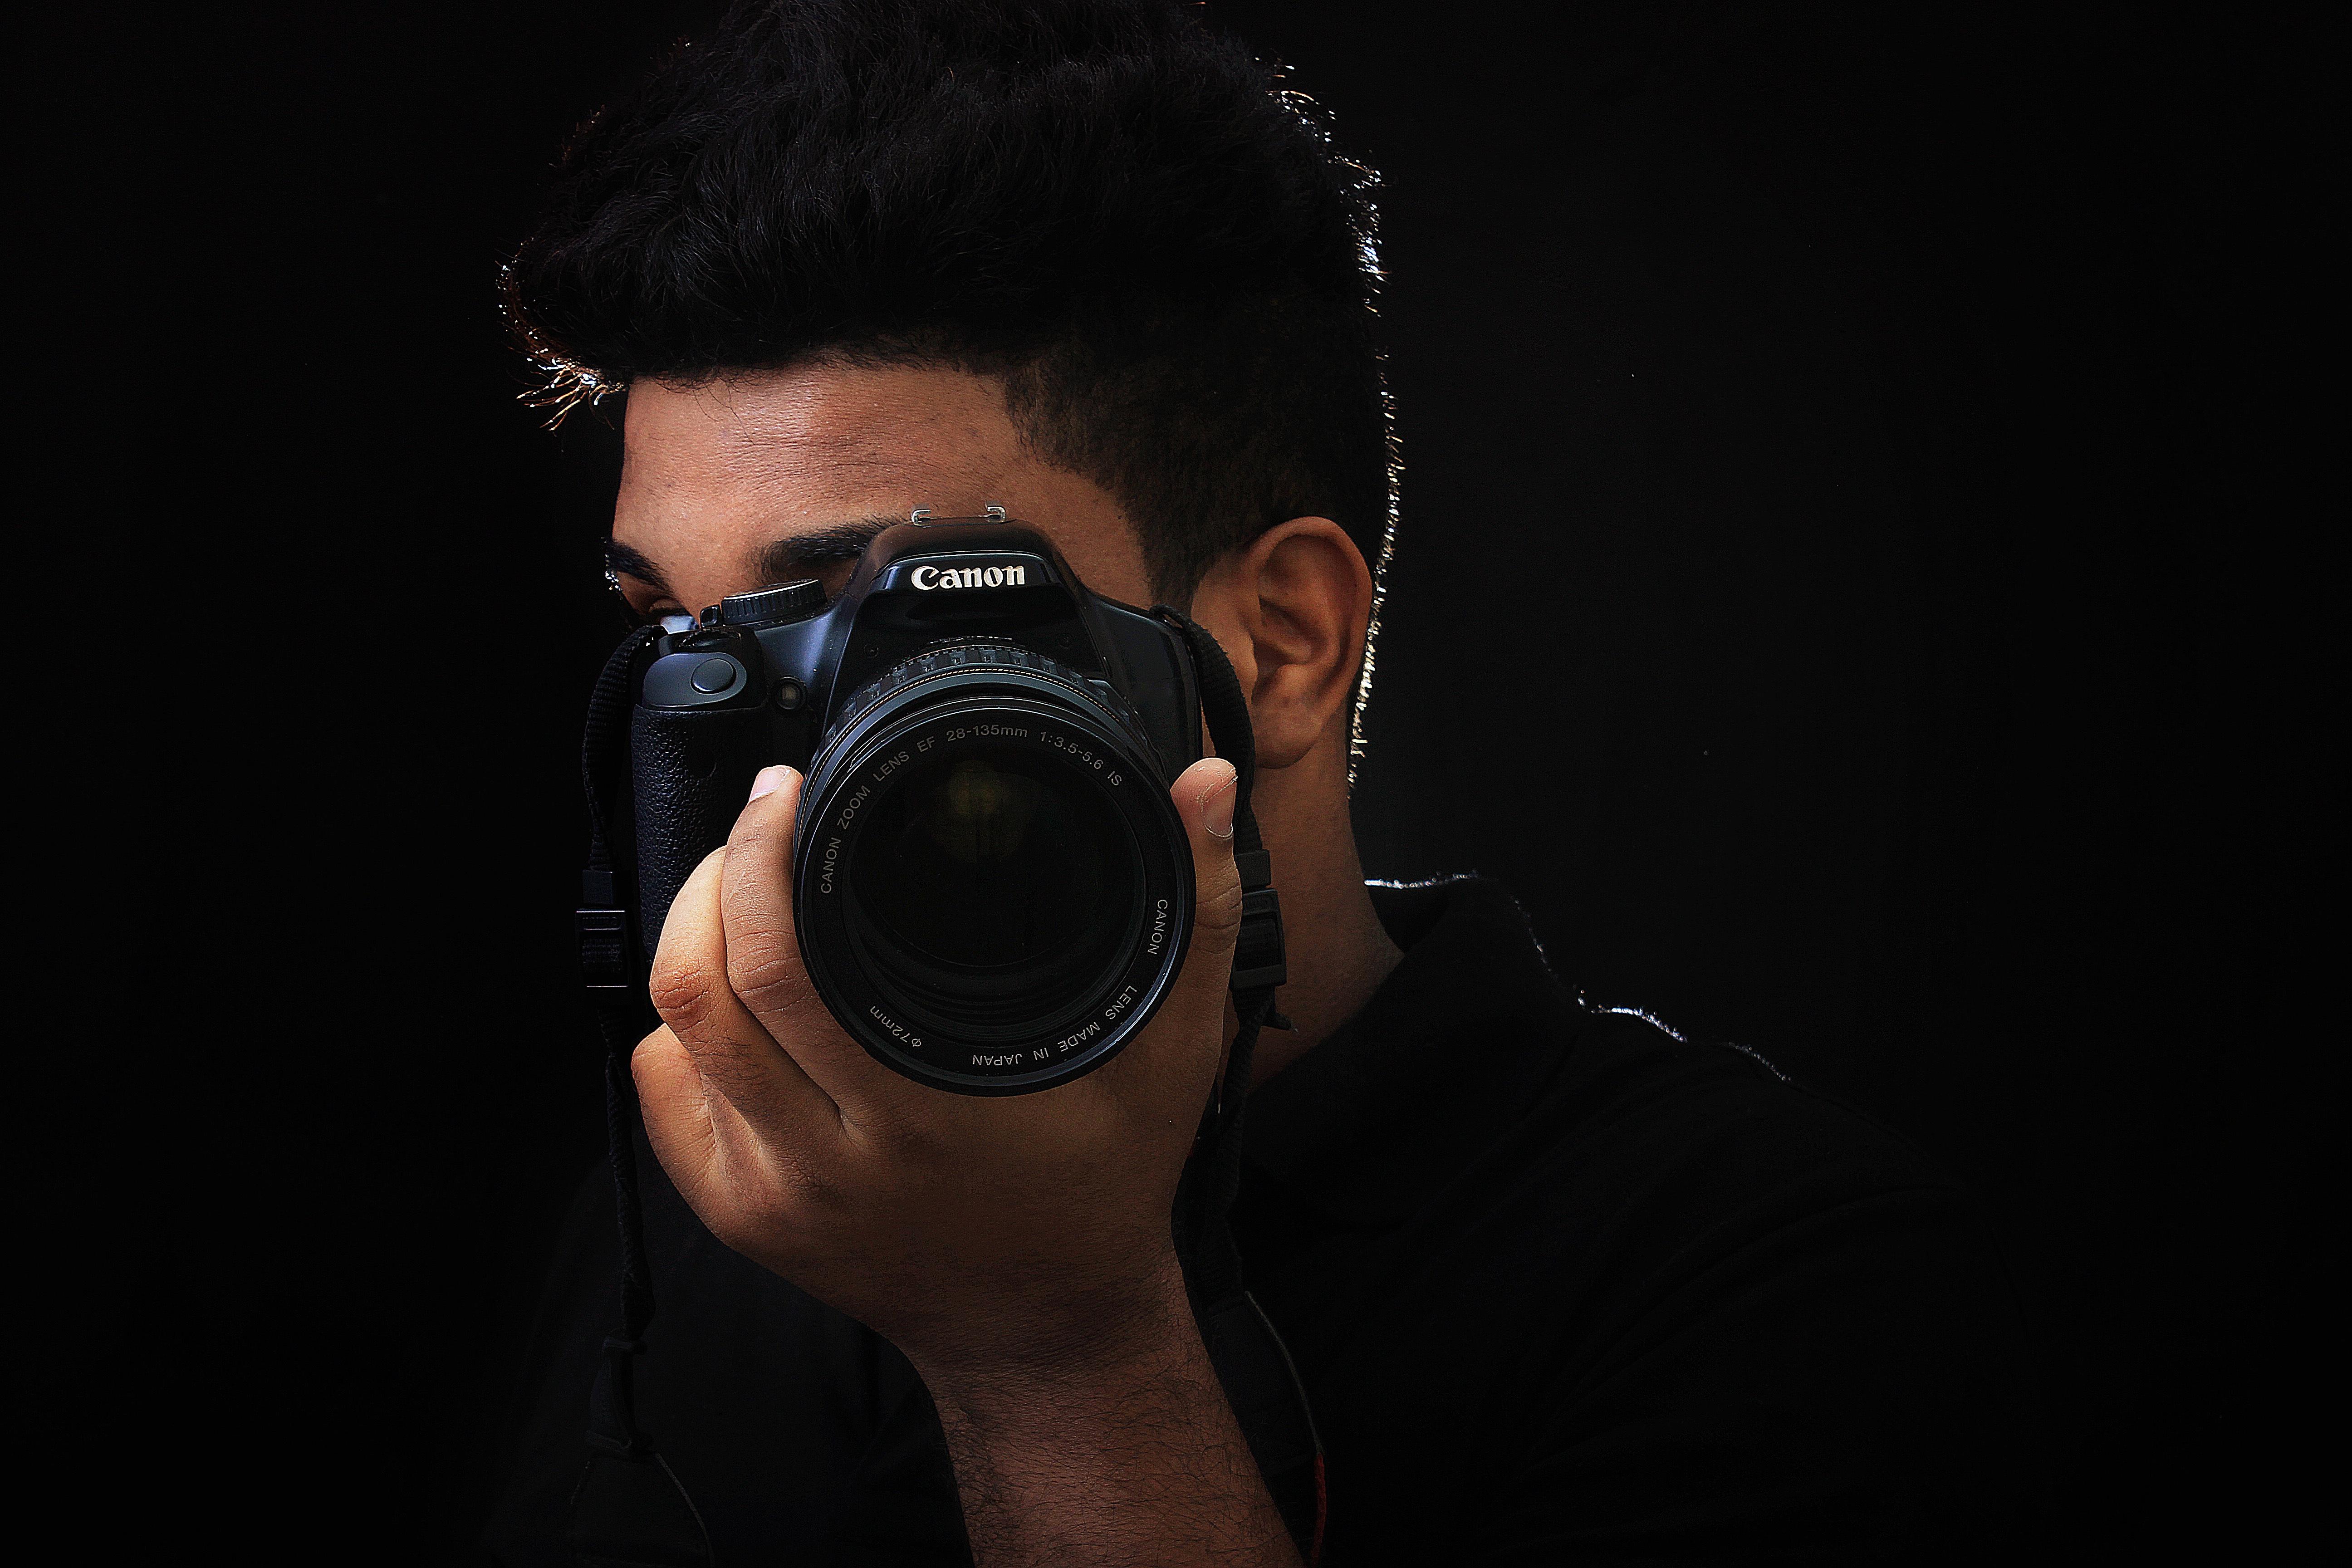 digital photo professional canon download free